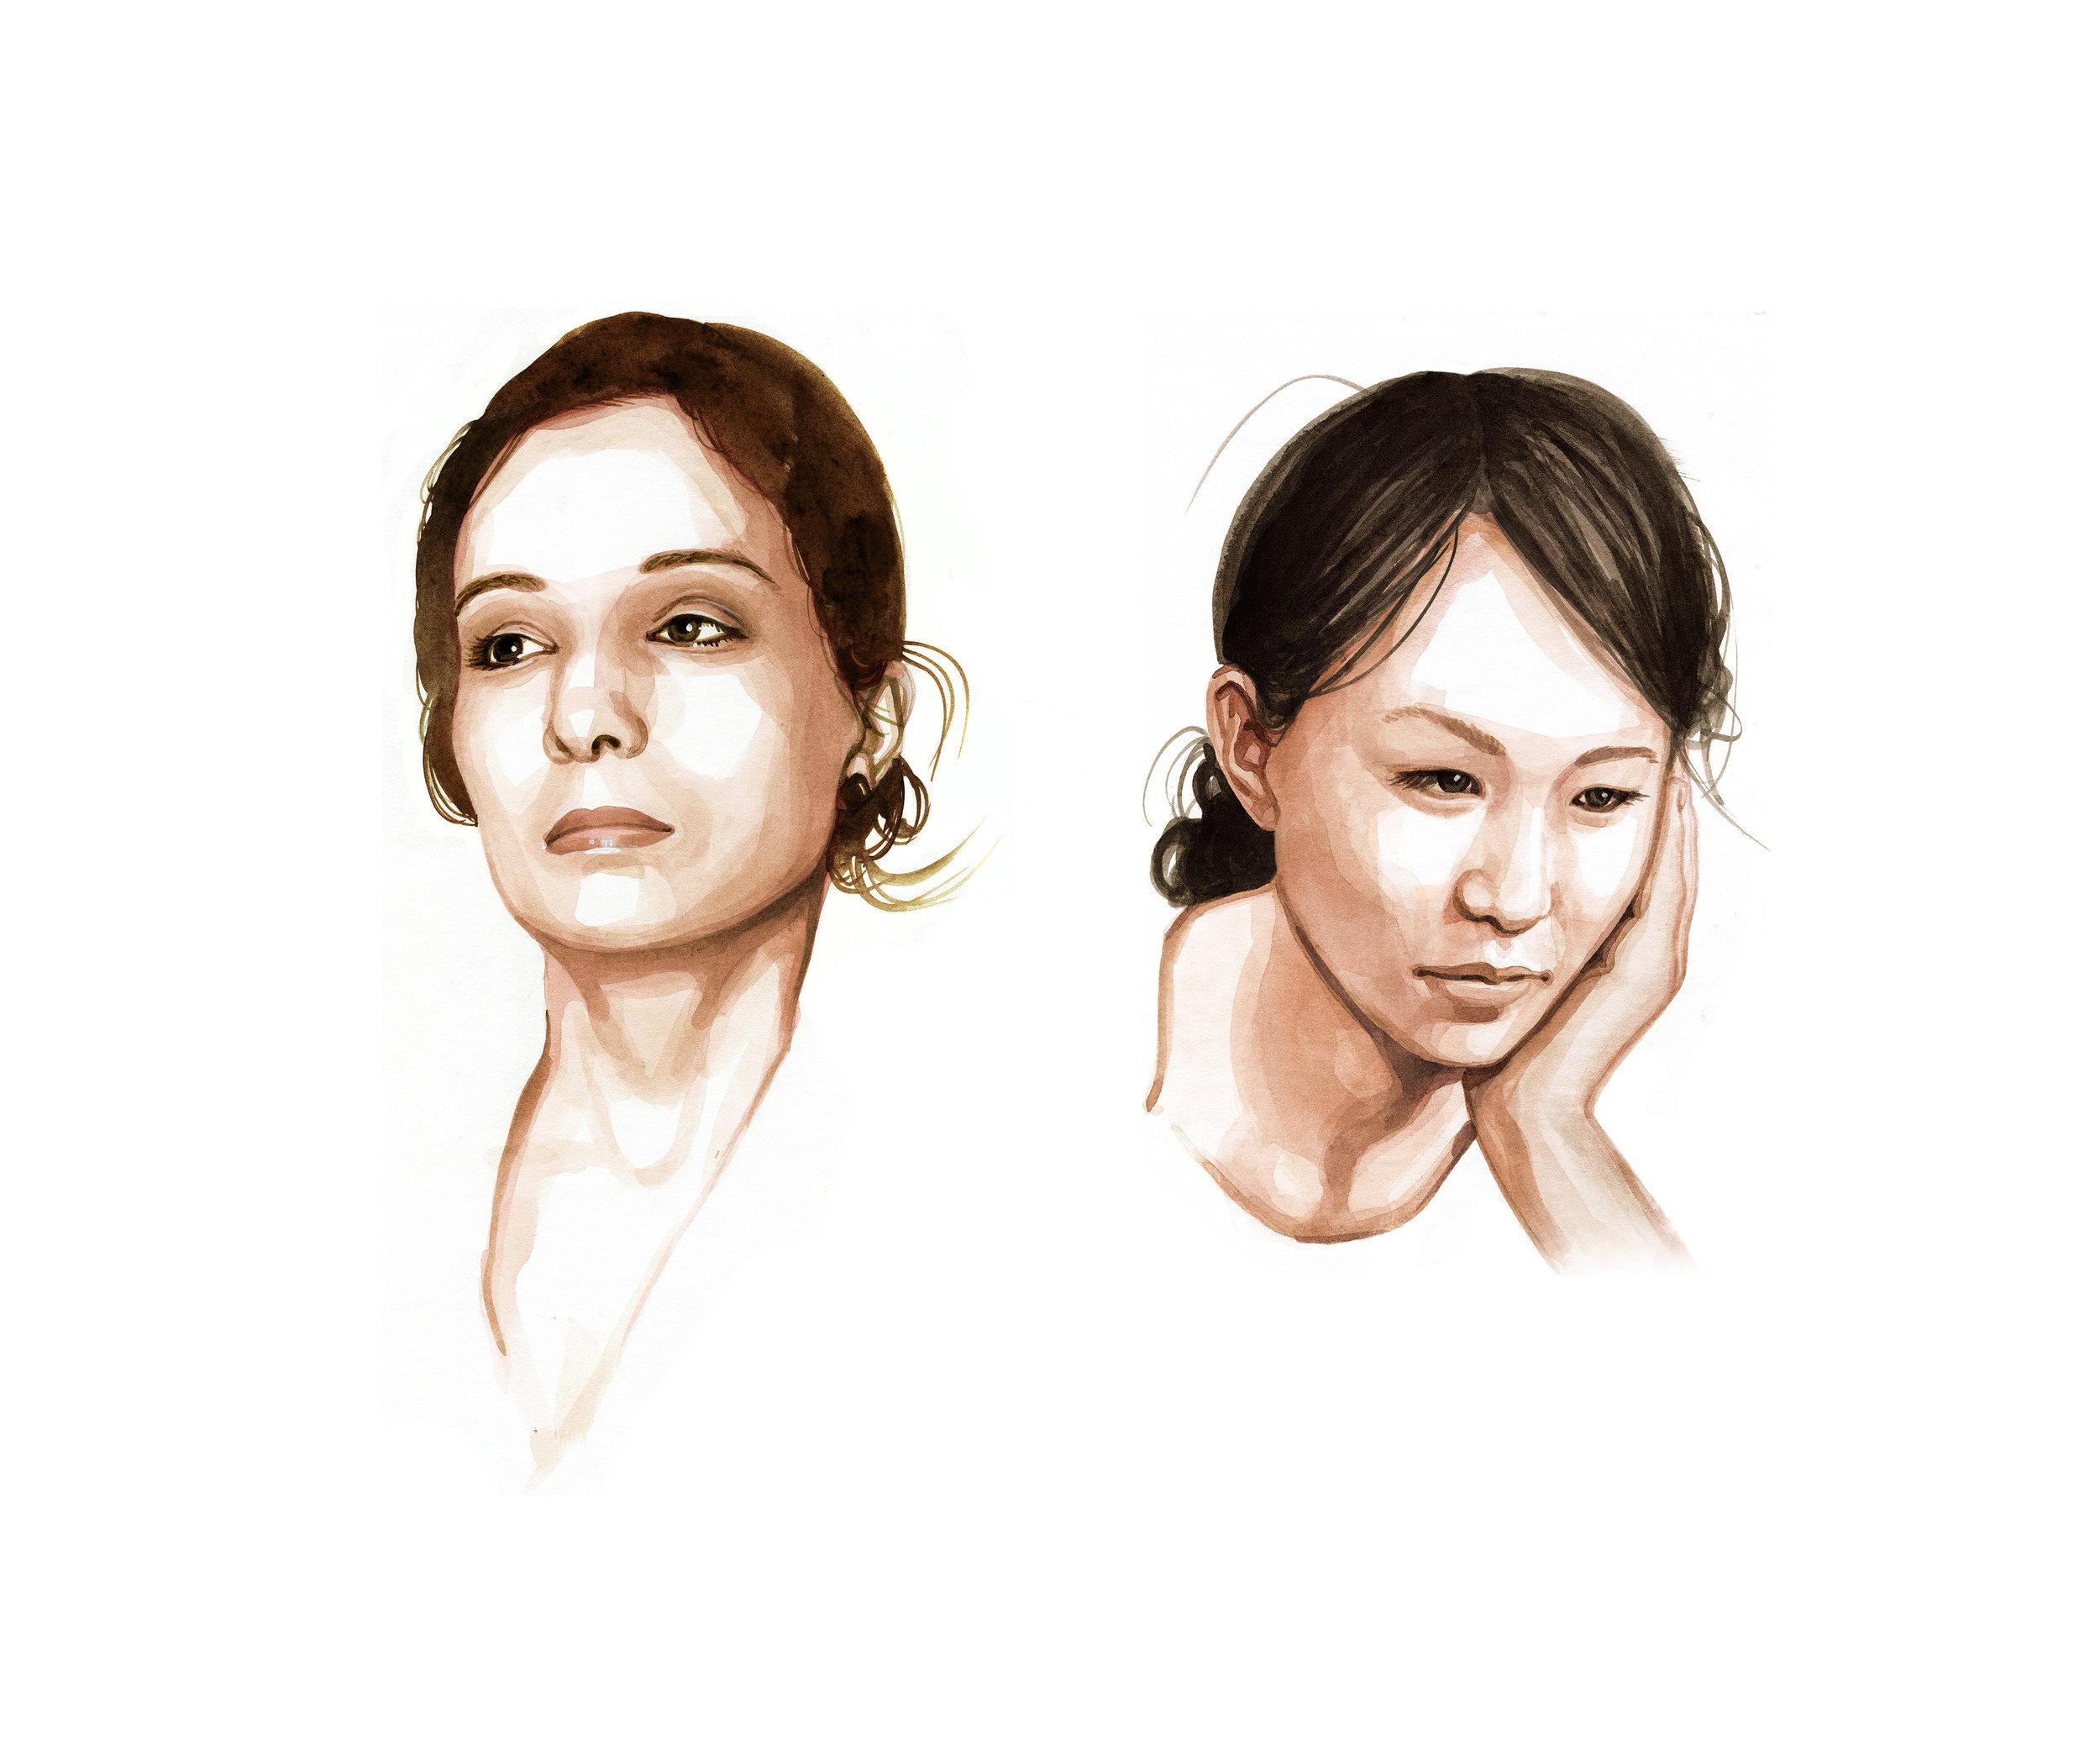 Pharmaceutical Portraits